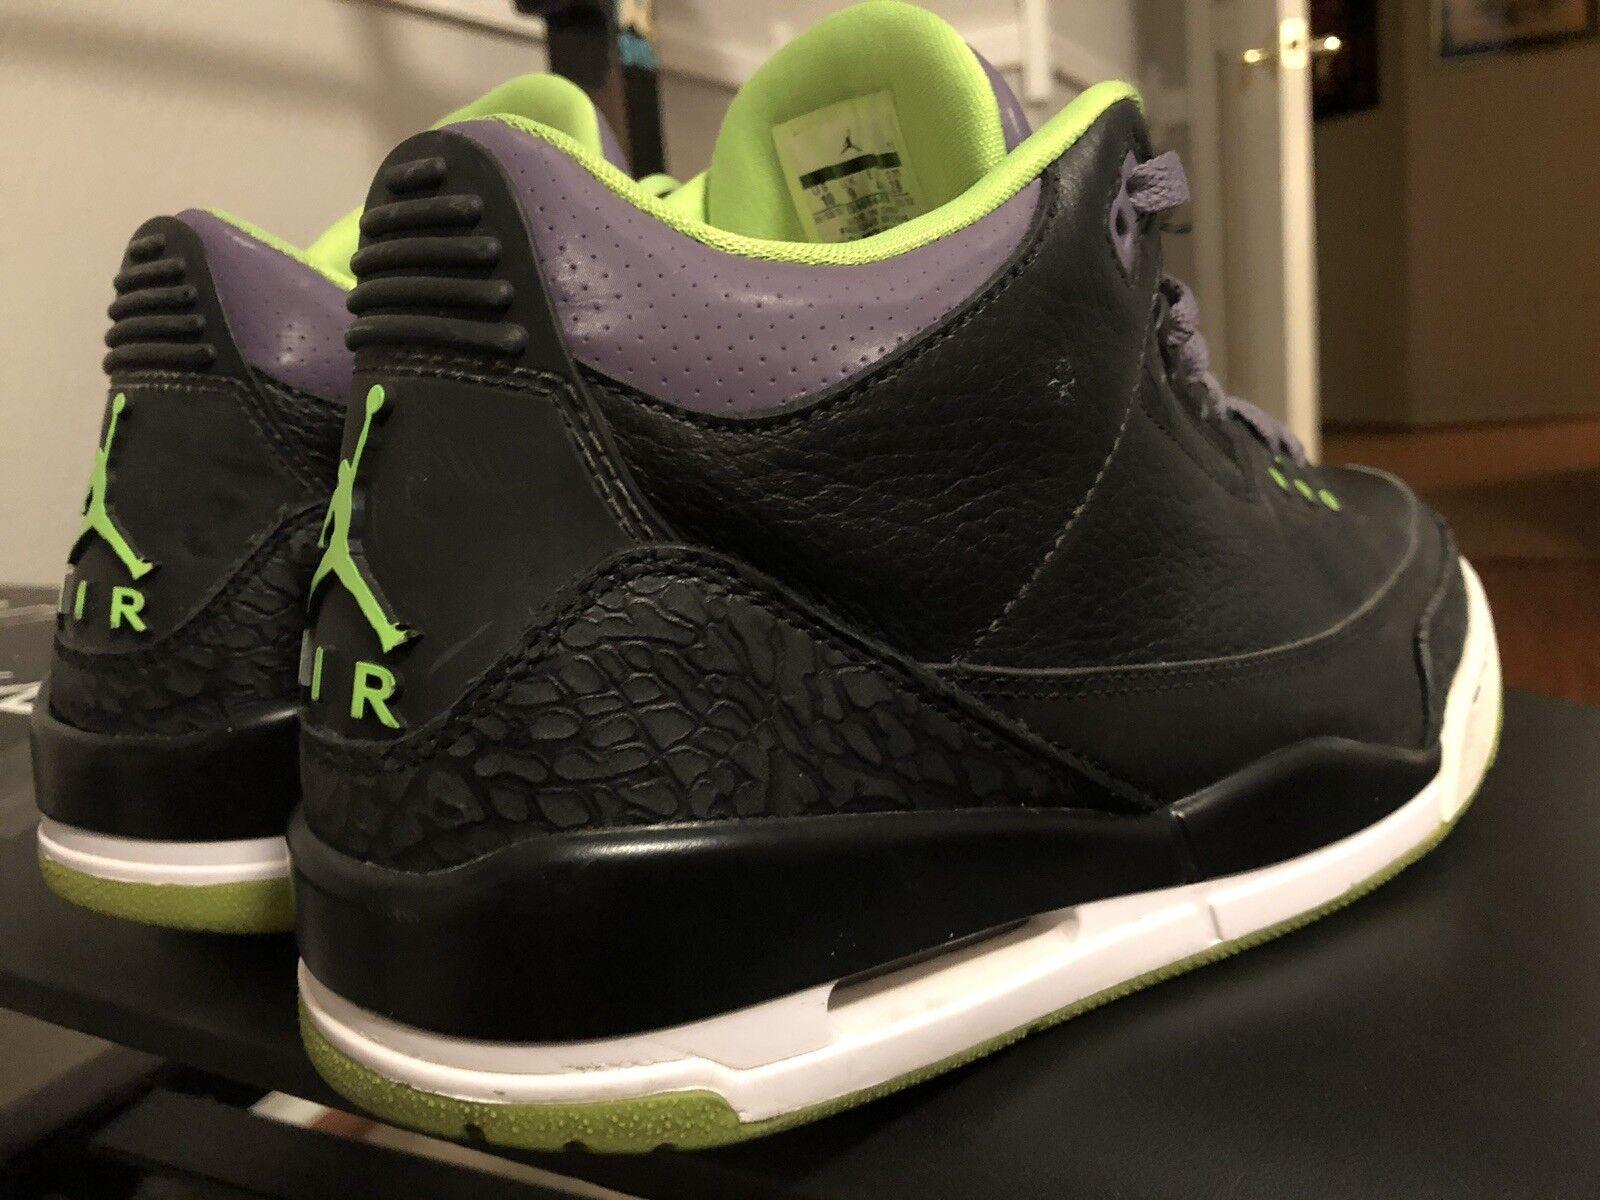 2012 Nike Air Jordan 3 III Joker Size 10